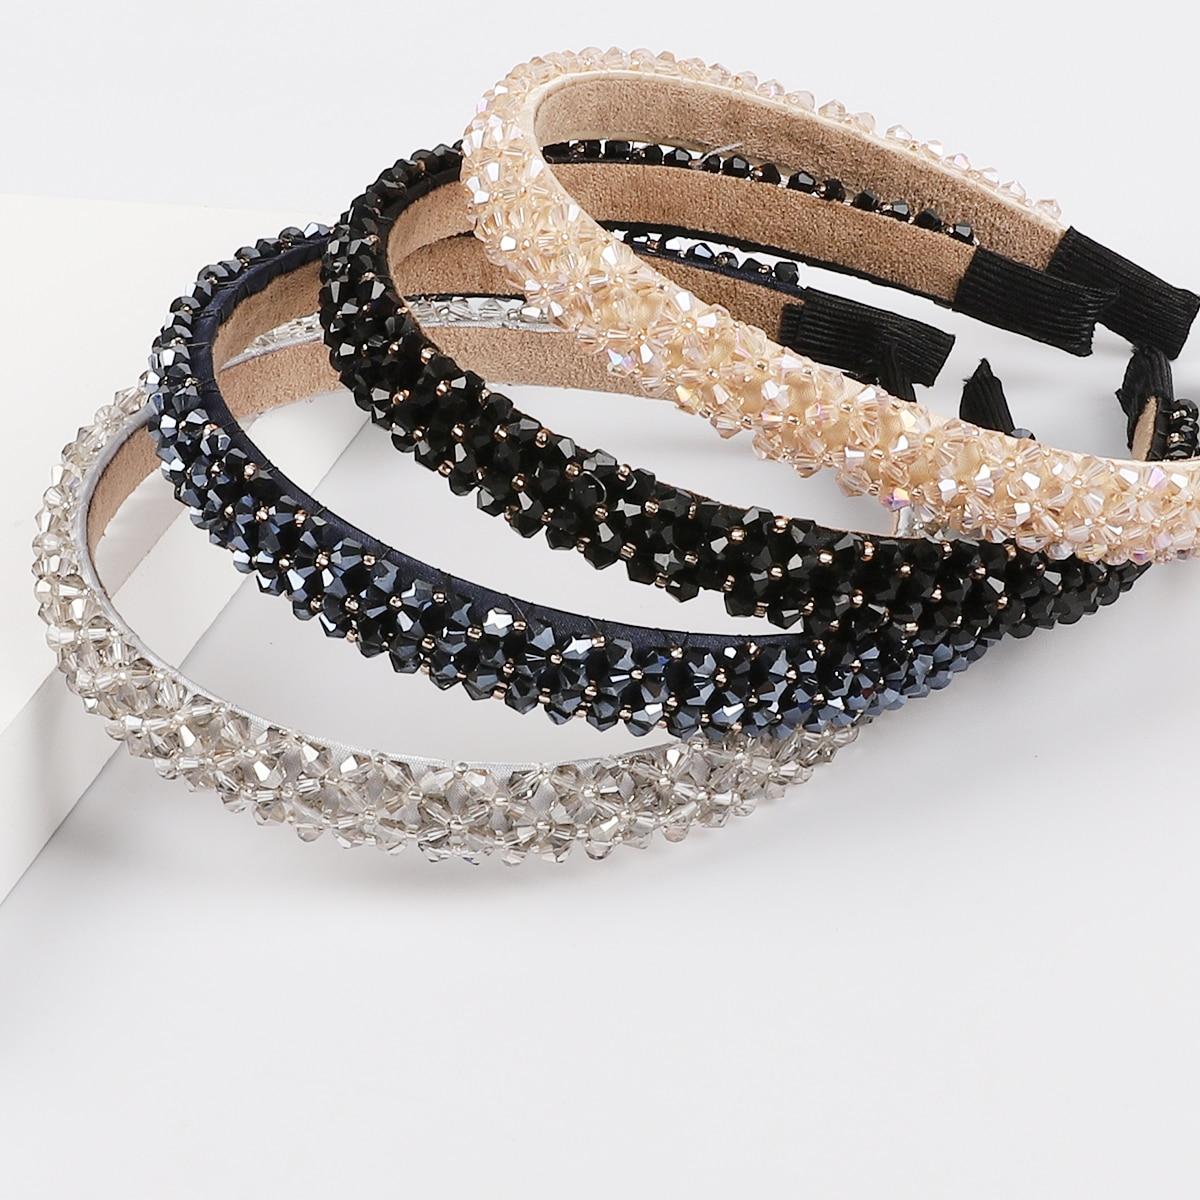 Women Girls Headwear Bling Rhinestone Crystal Headband Hairband Hair Accessories